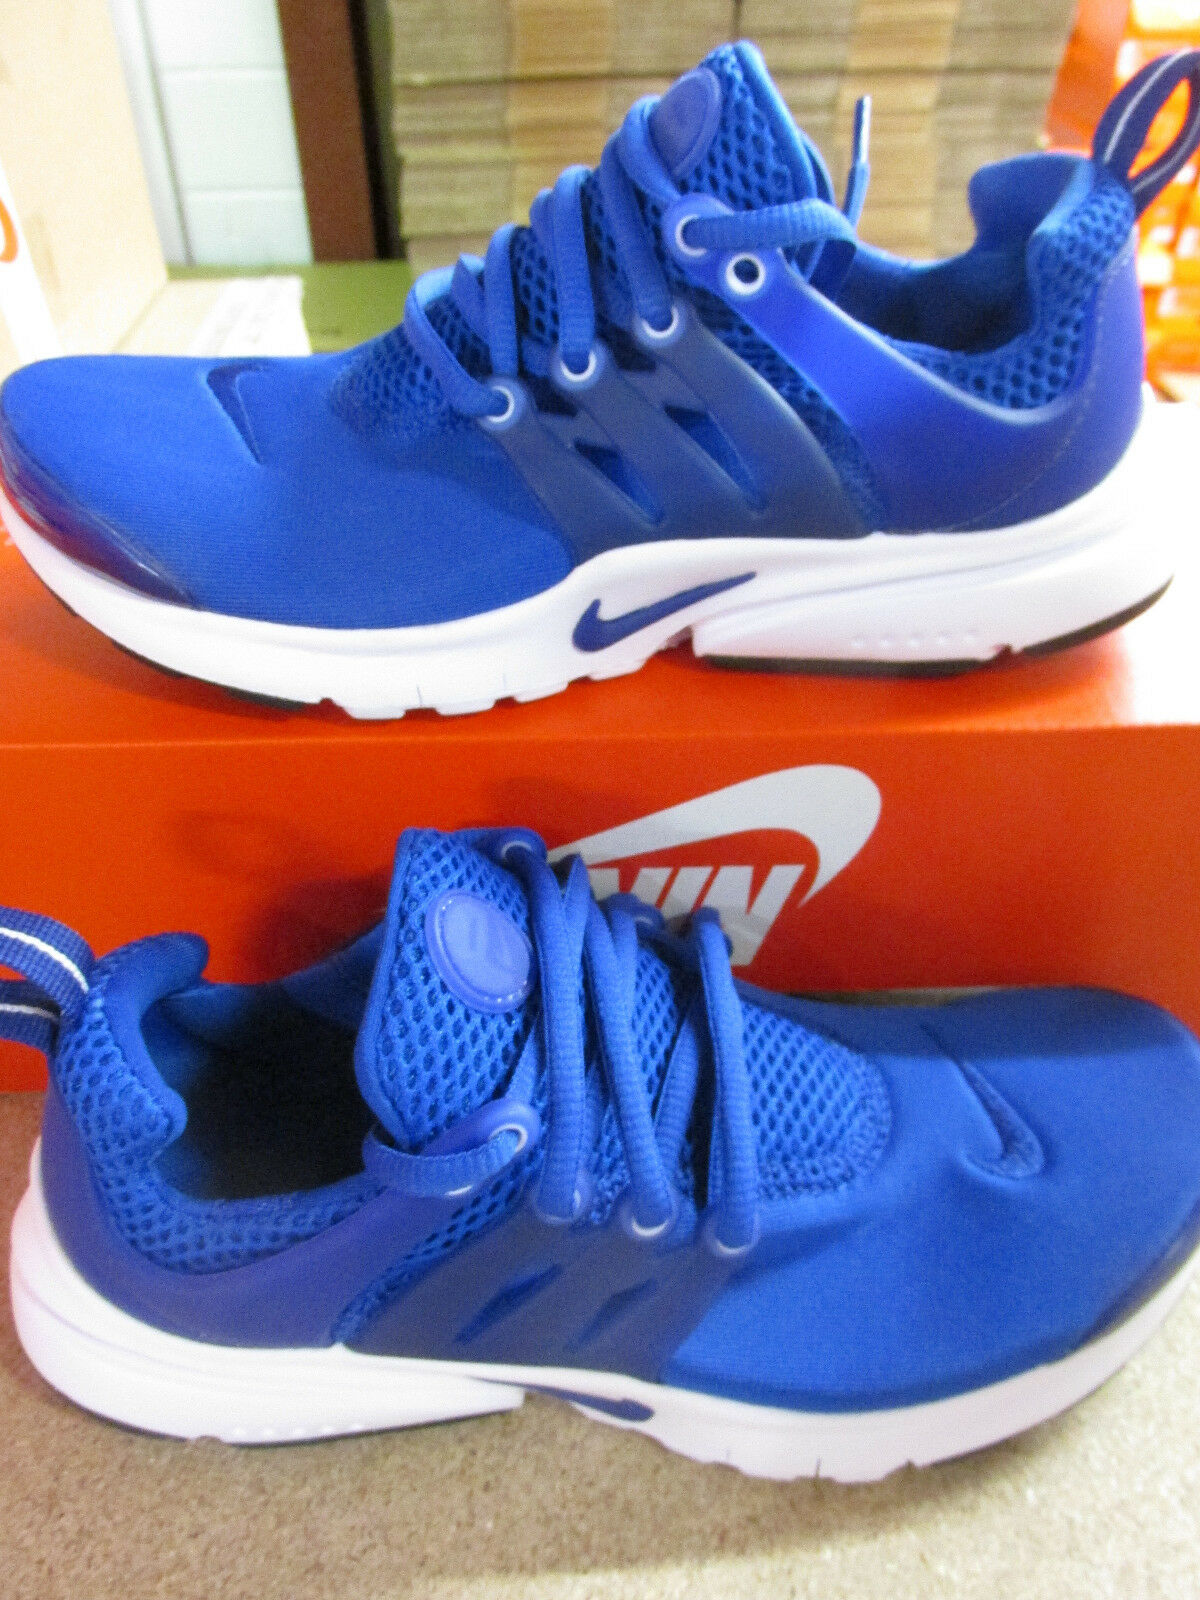 Nike 833875 Presto (Gs) Jugend Laufschuhe 833875 Nike 441 Turnschuhe 7b9124